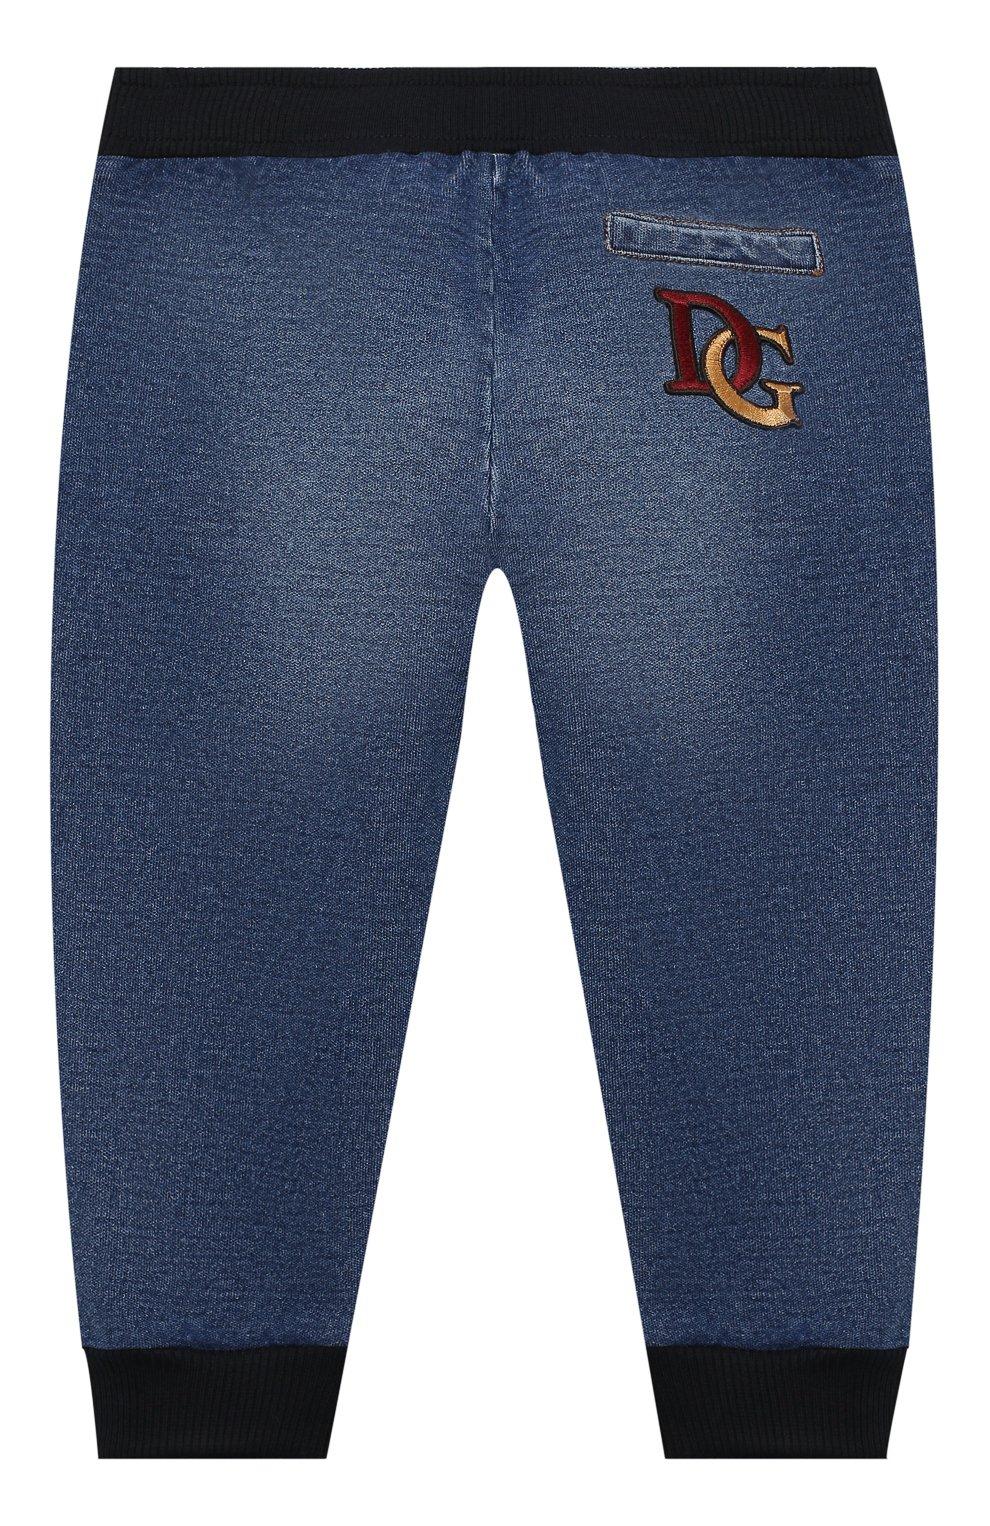 Детские джинсы DOLCE & GABBANA синего цвета, арт. L2JP7G/G7XNY   Фото 2